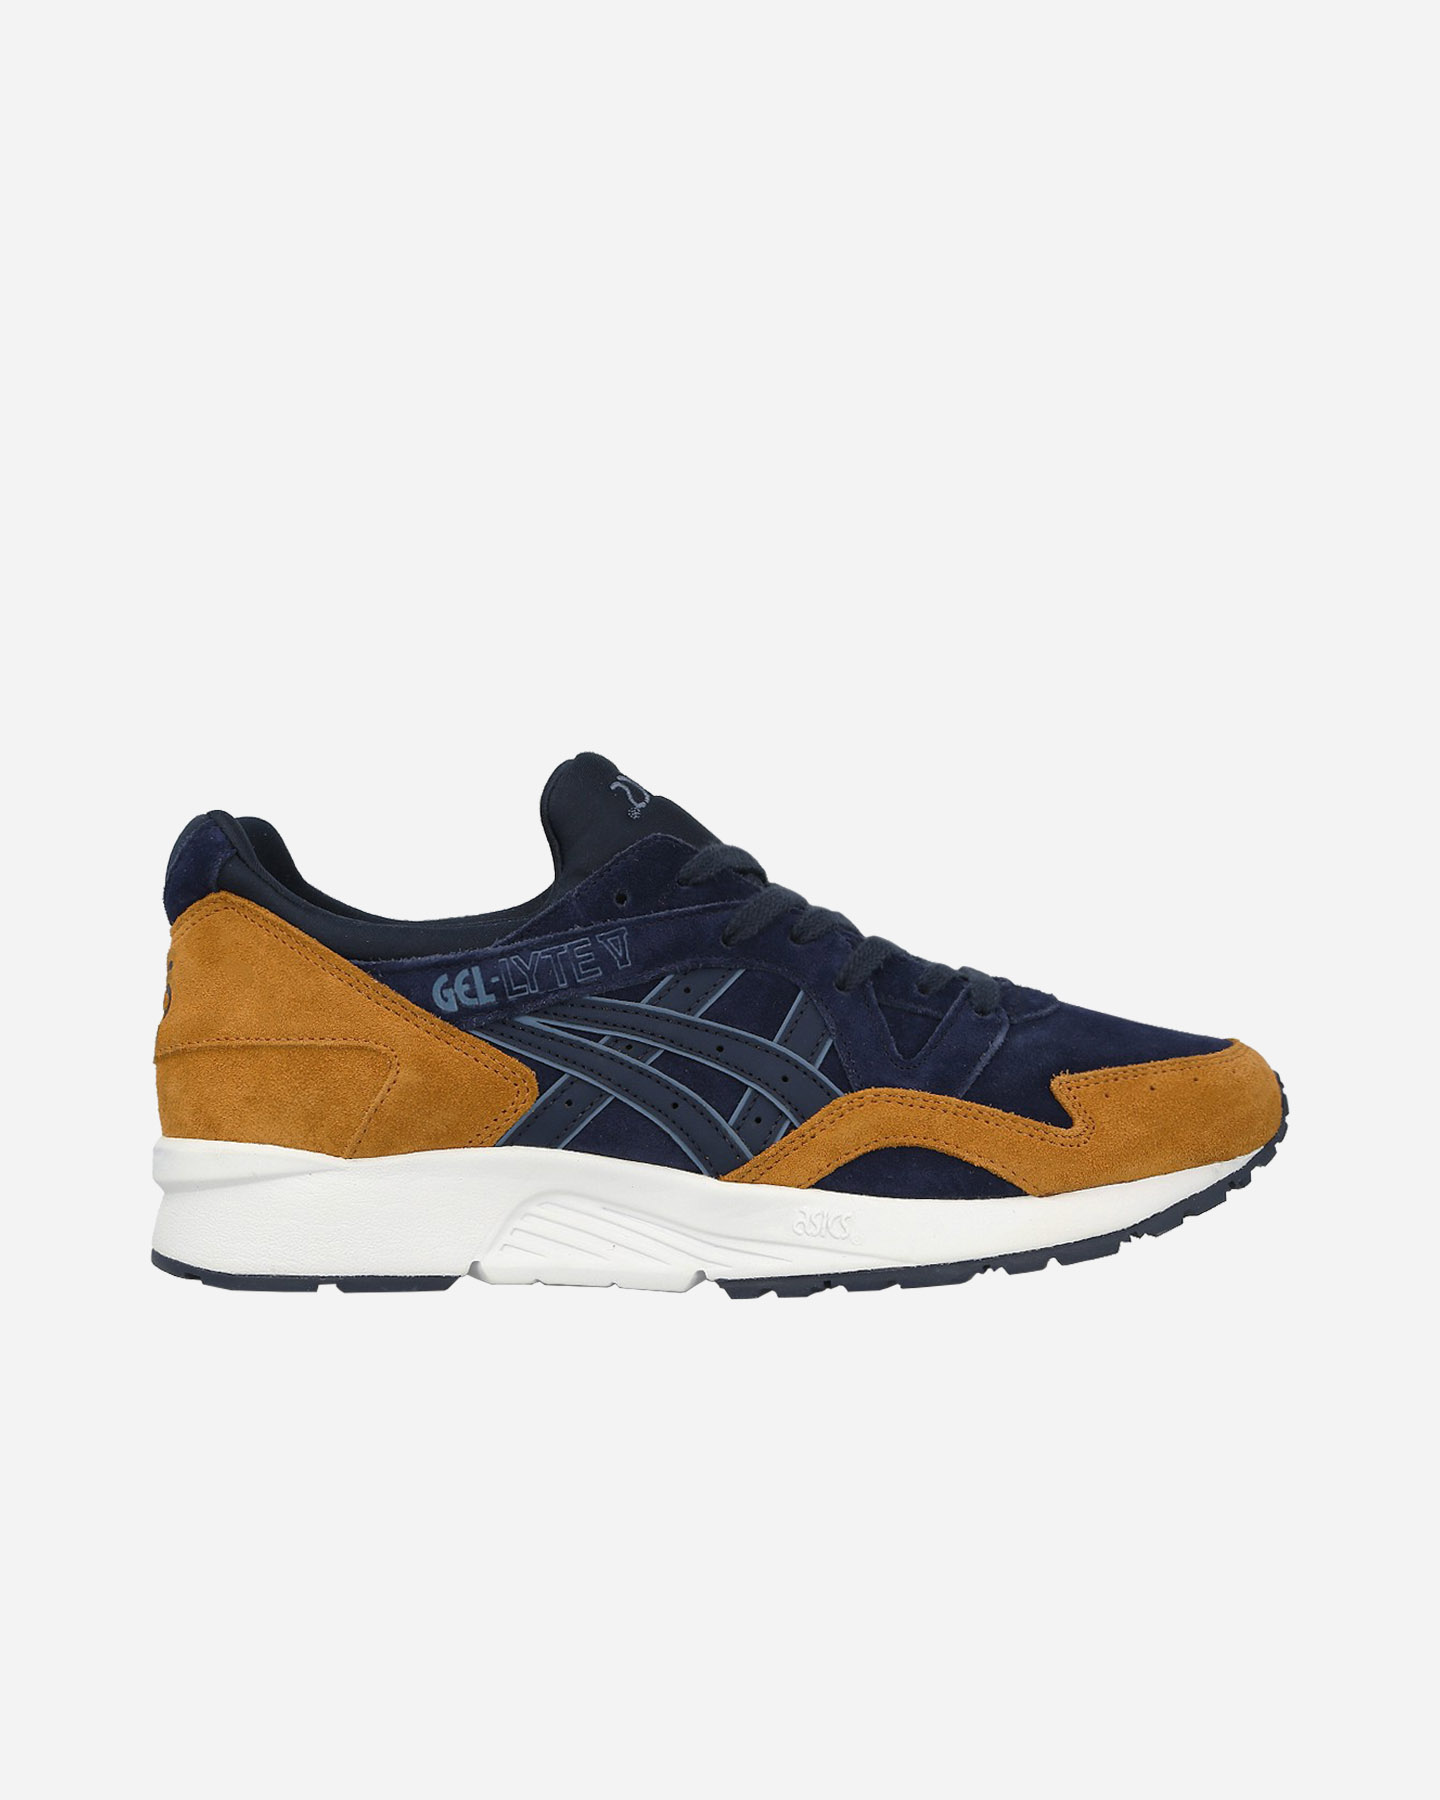 218b185287 Scarpe Sneakers Asics Gel-lyte V M HL7B3 | Cisalfa Sport